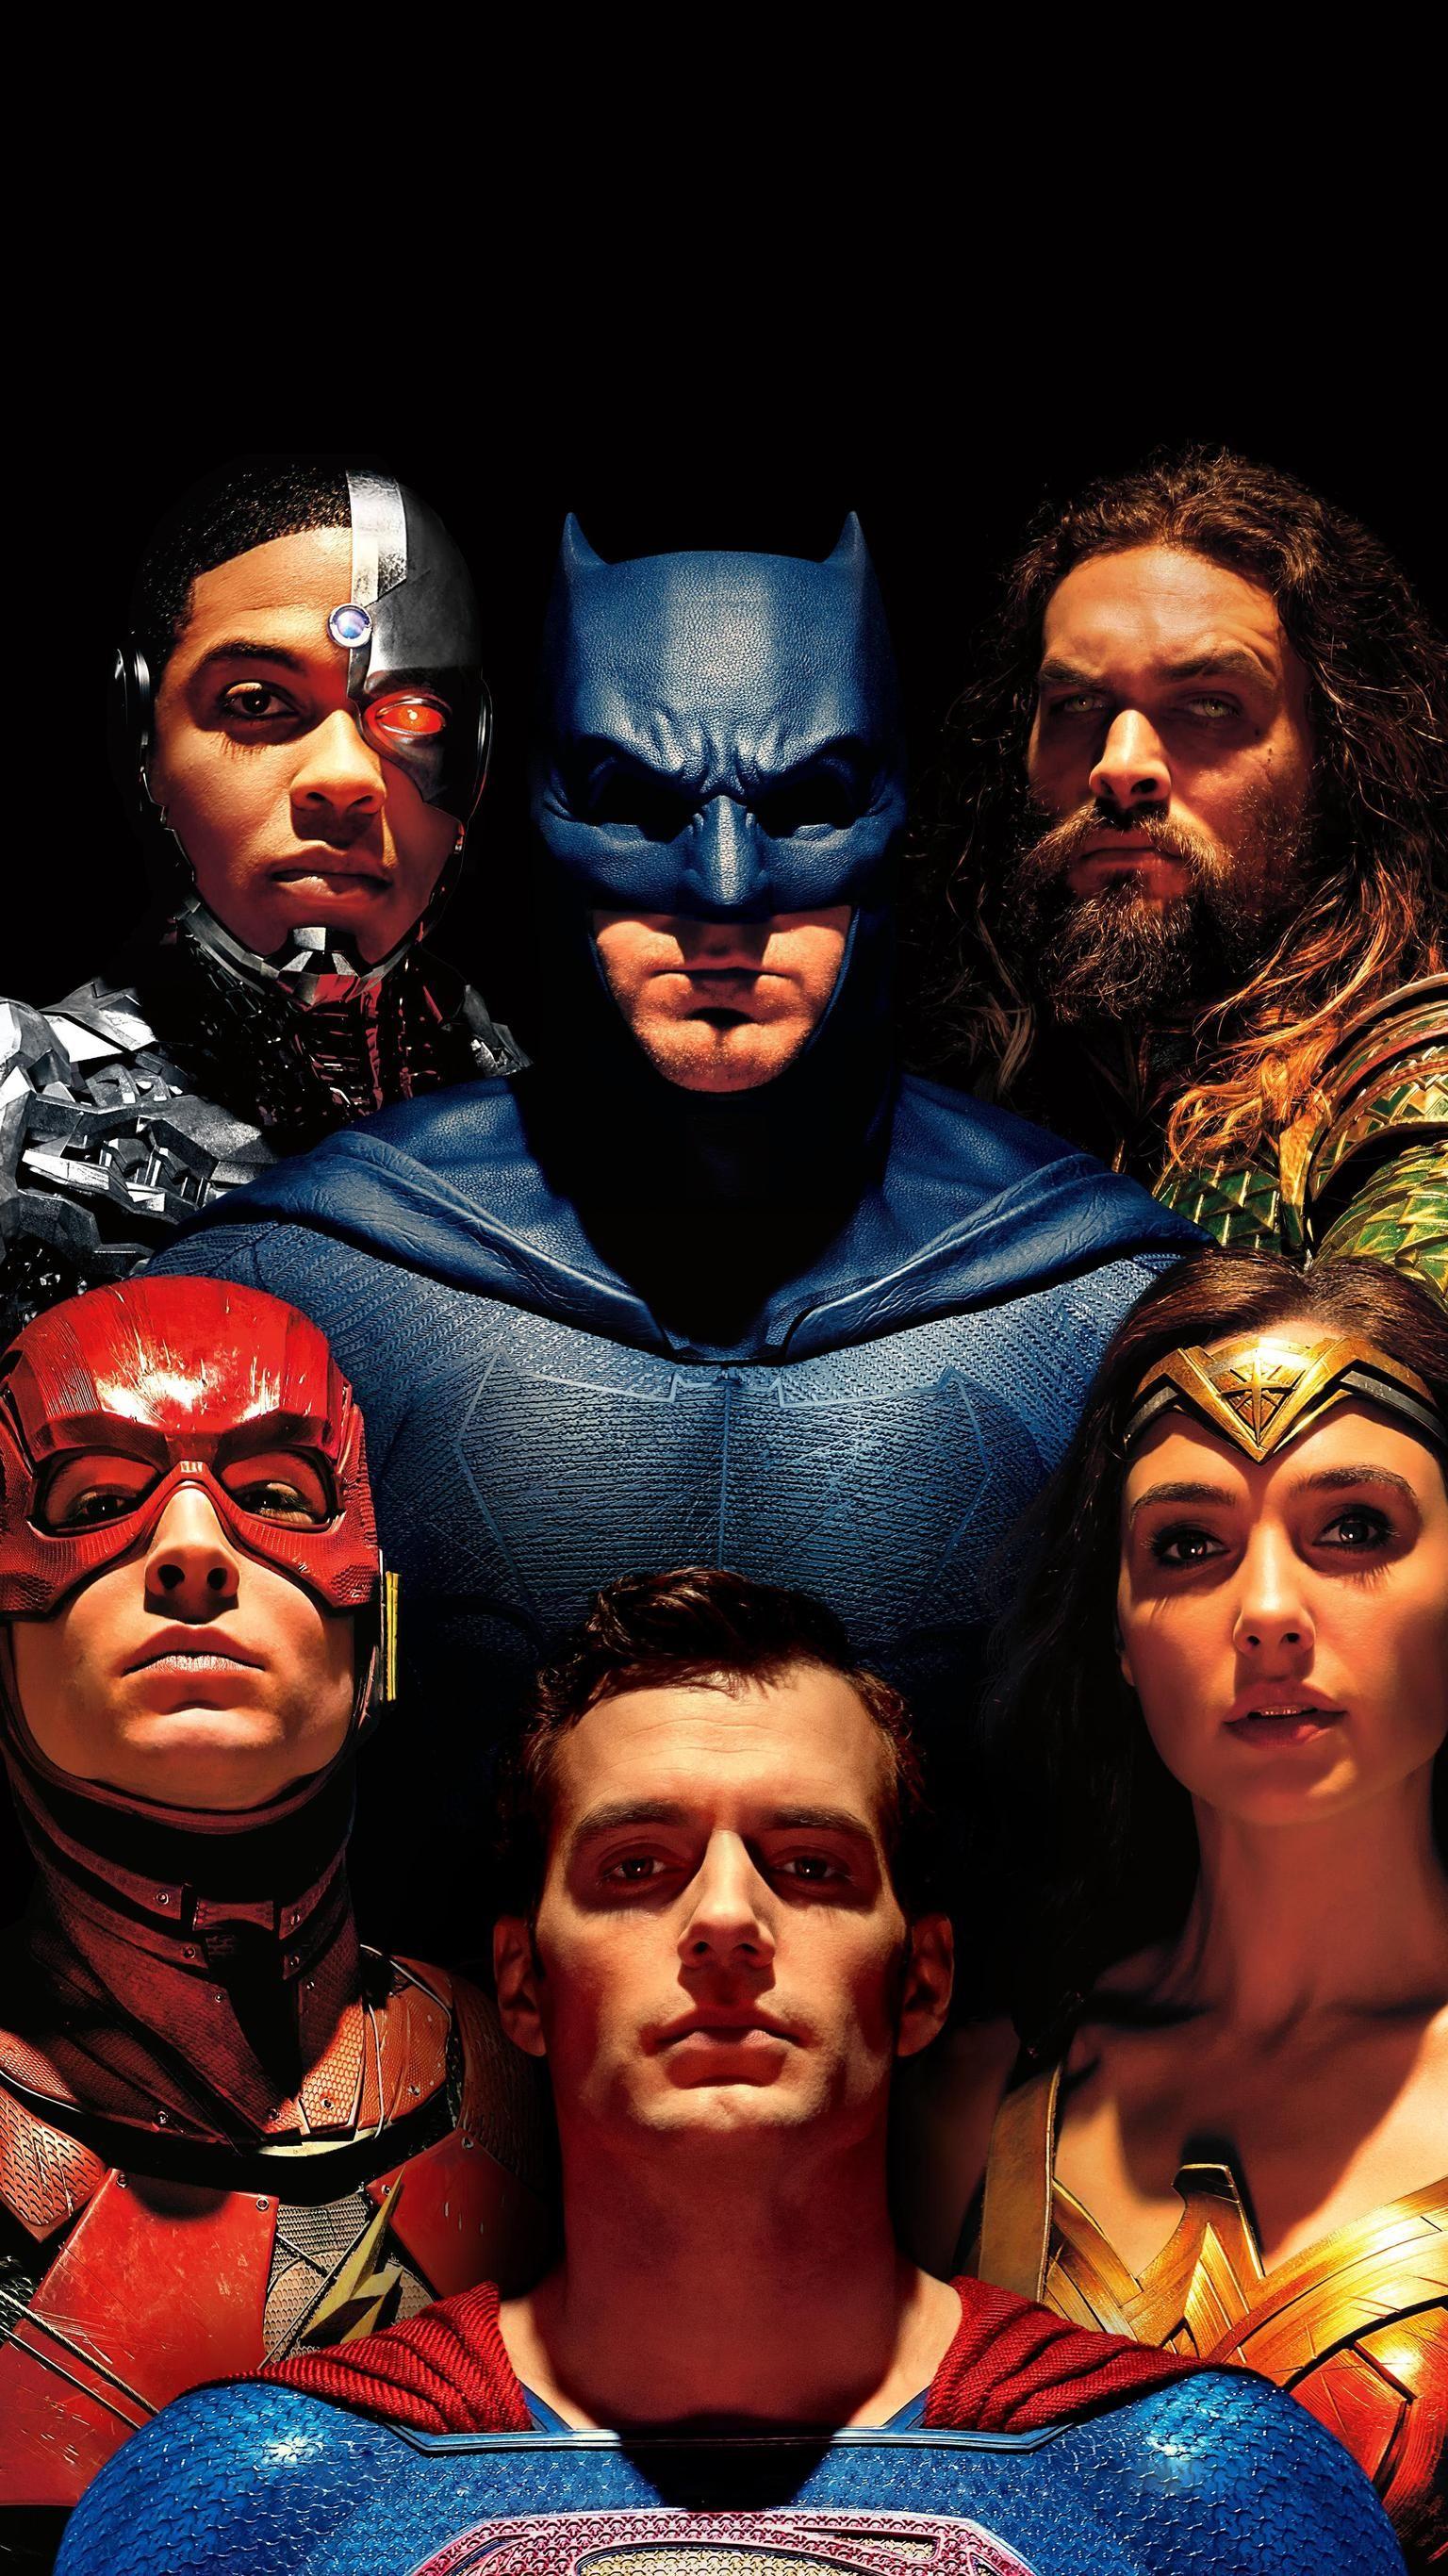 Zack Snyder Phone Wallpapers Moviemania Watch Justice League Justice League 2017 Justice League Full Movie